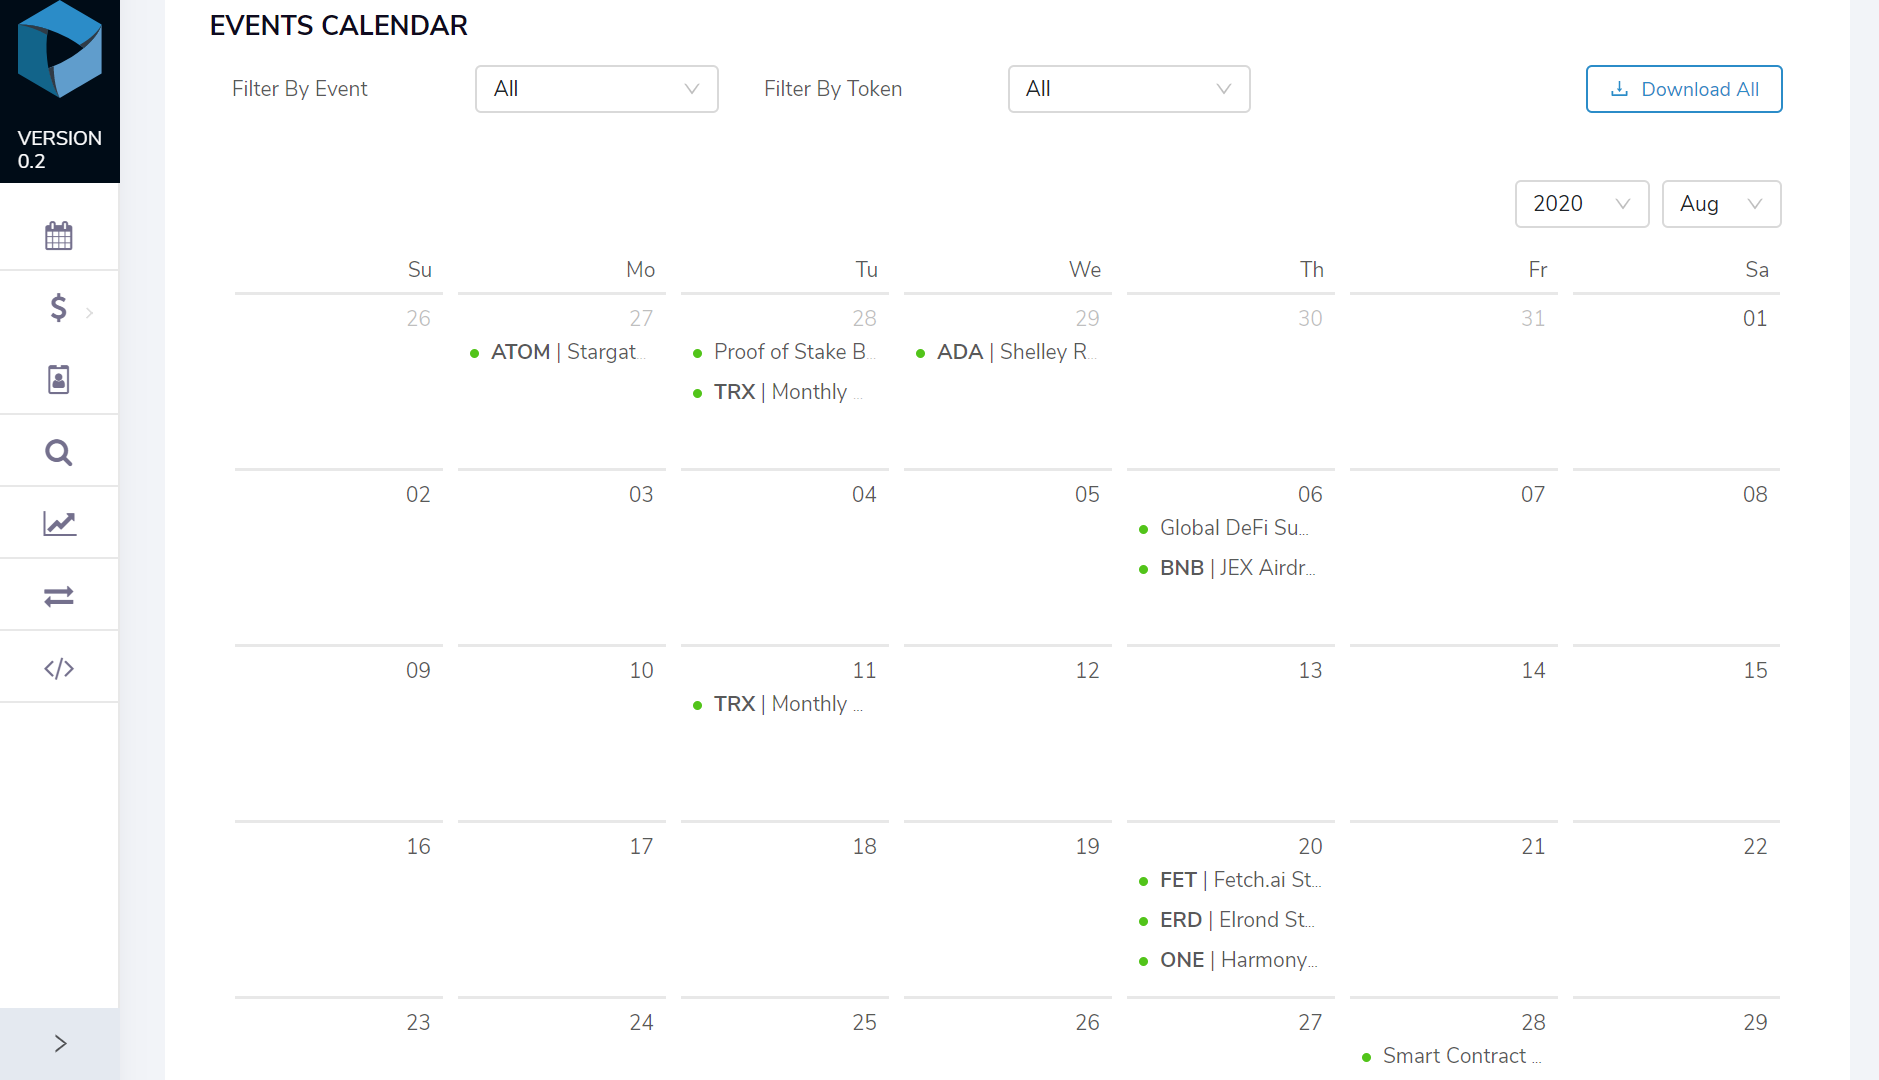 Image of the DAR Crypto Events Calendar